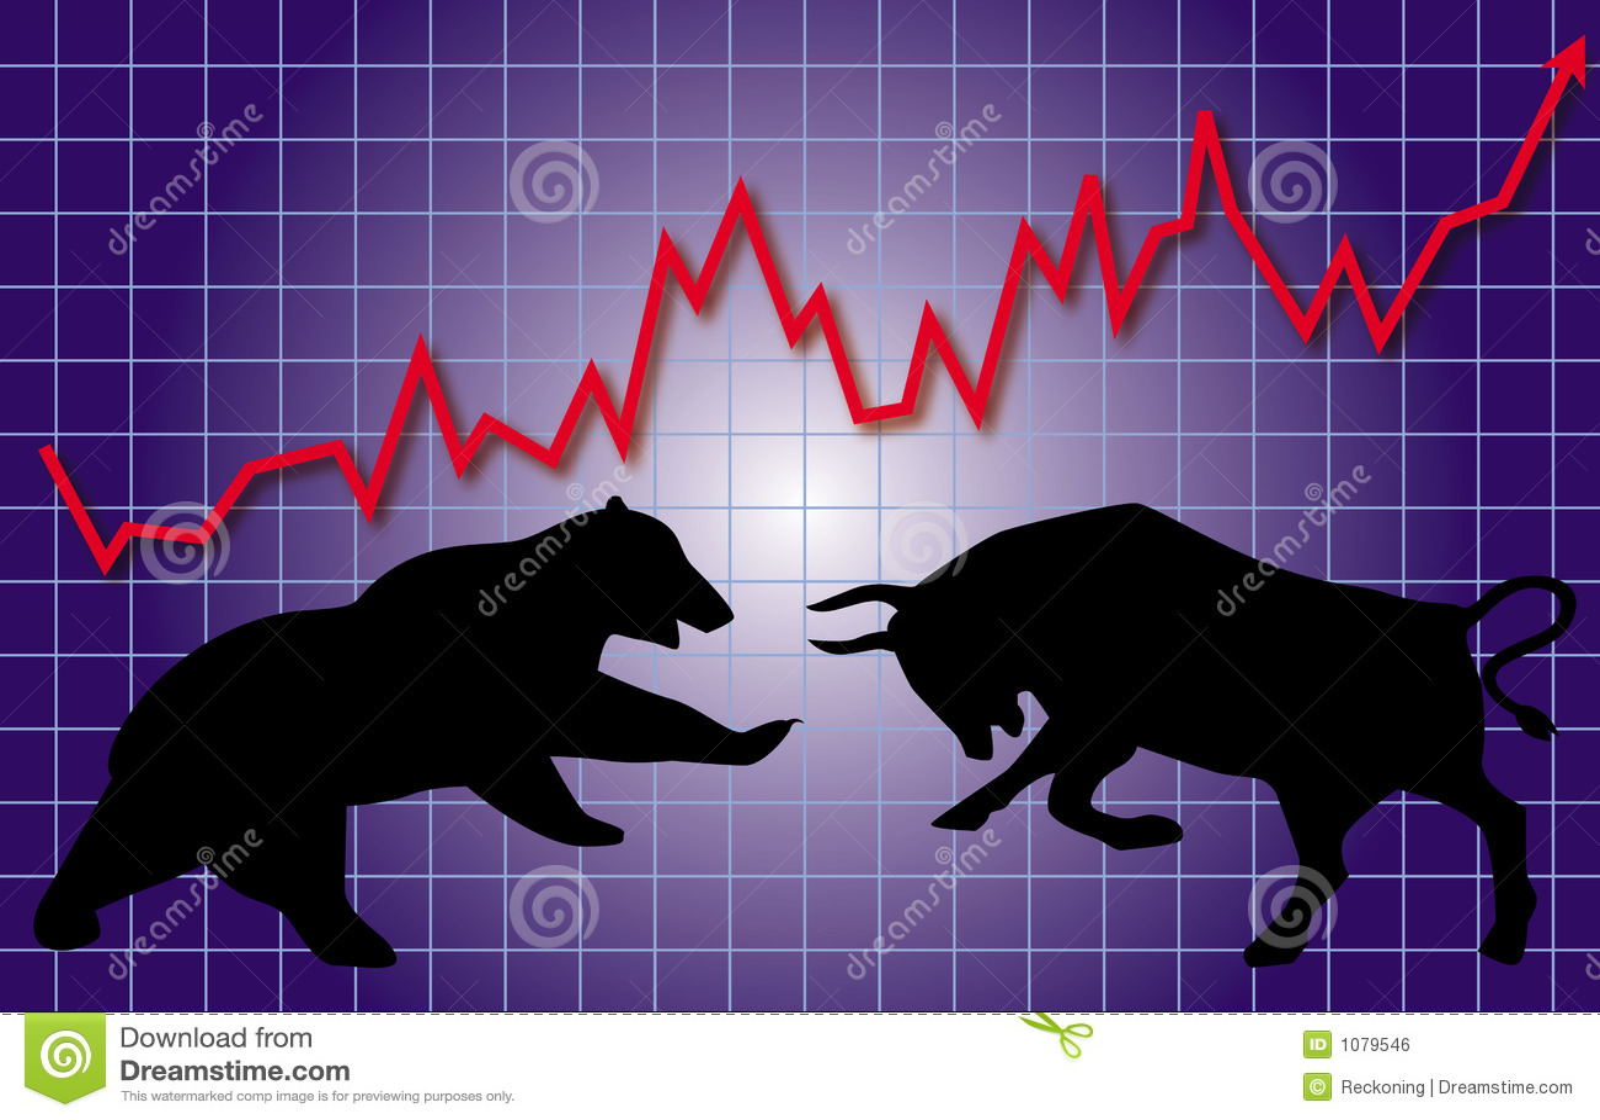 bulls bears in the stock market